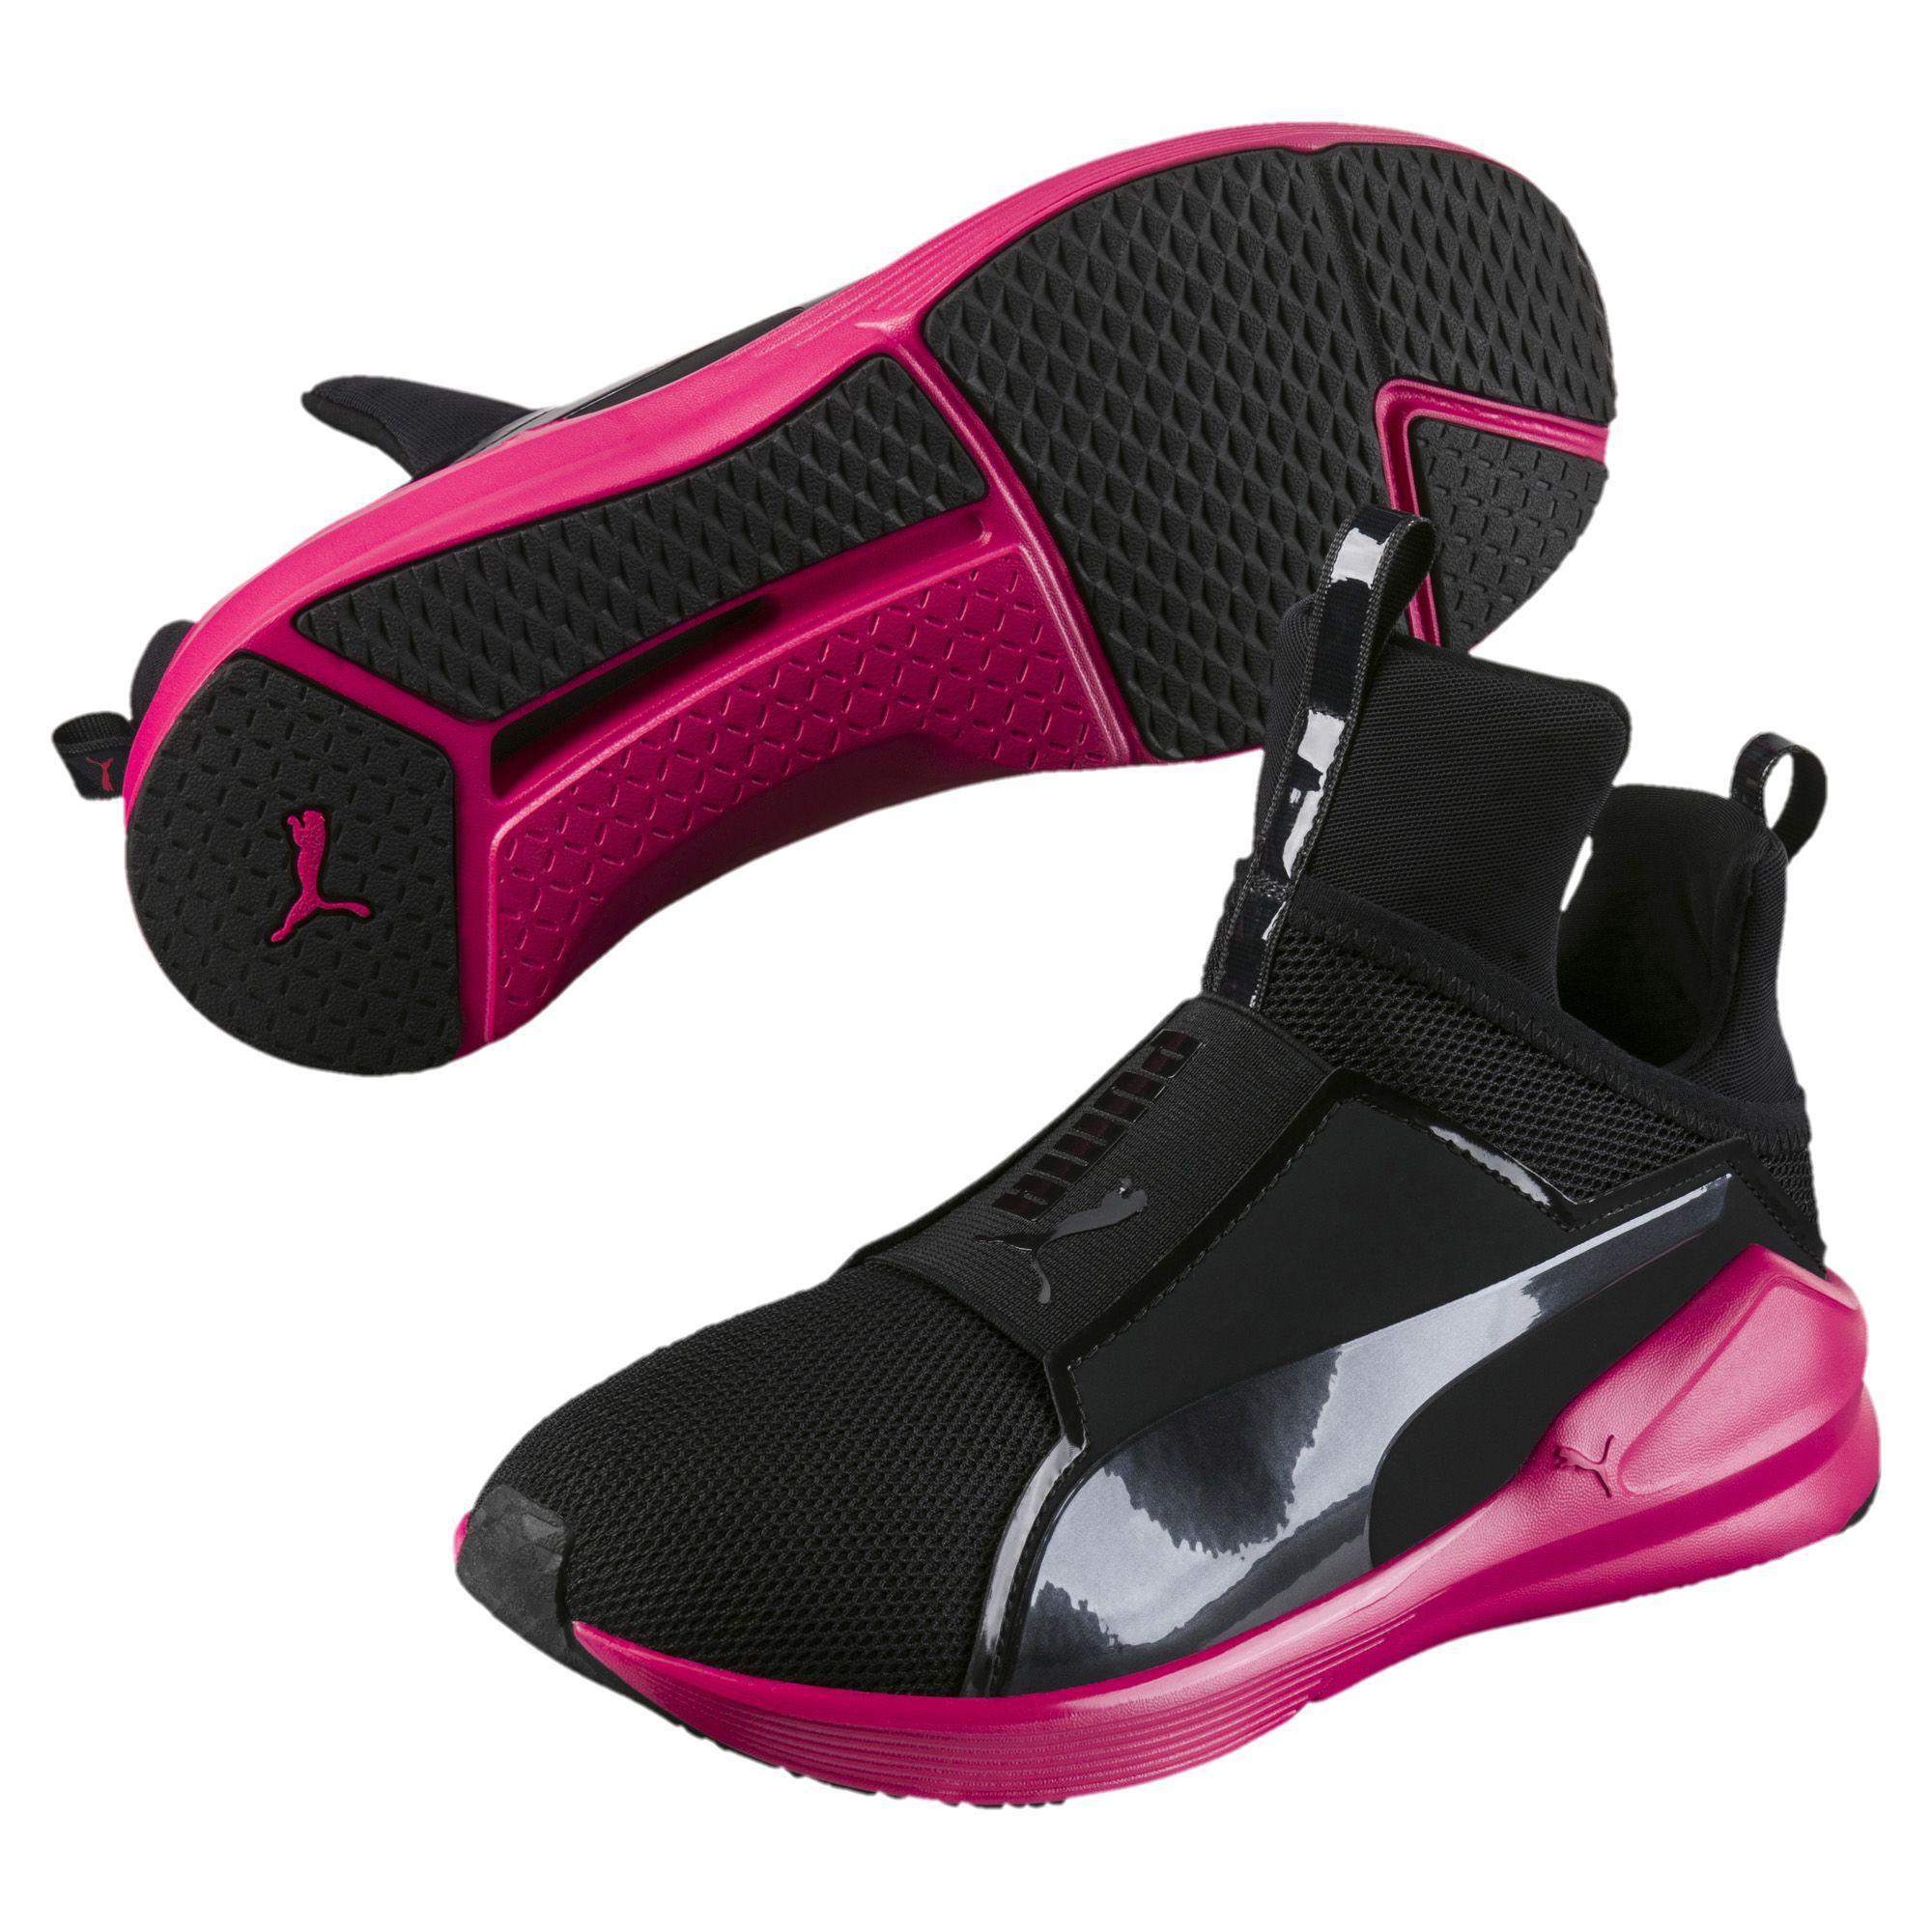 070b6fee2df1 Black Black Black Puma Fierce in Core Training Lyst Lyst Lyst Shoes Women s  xqf0pwp1dR